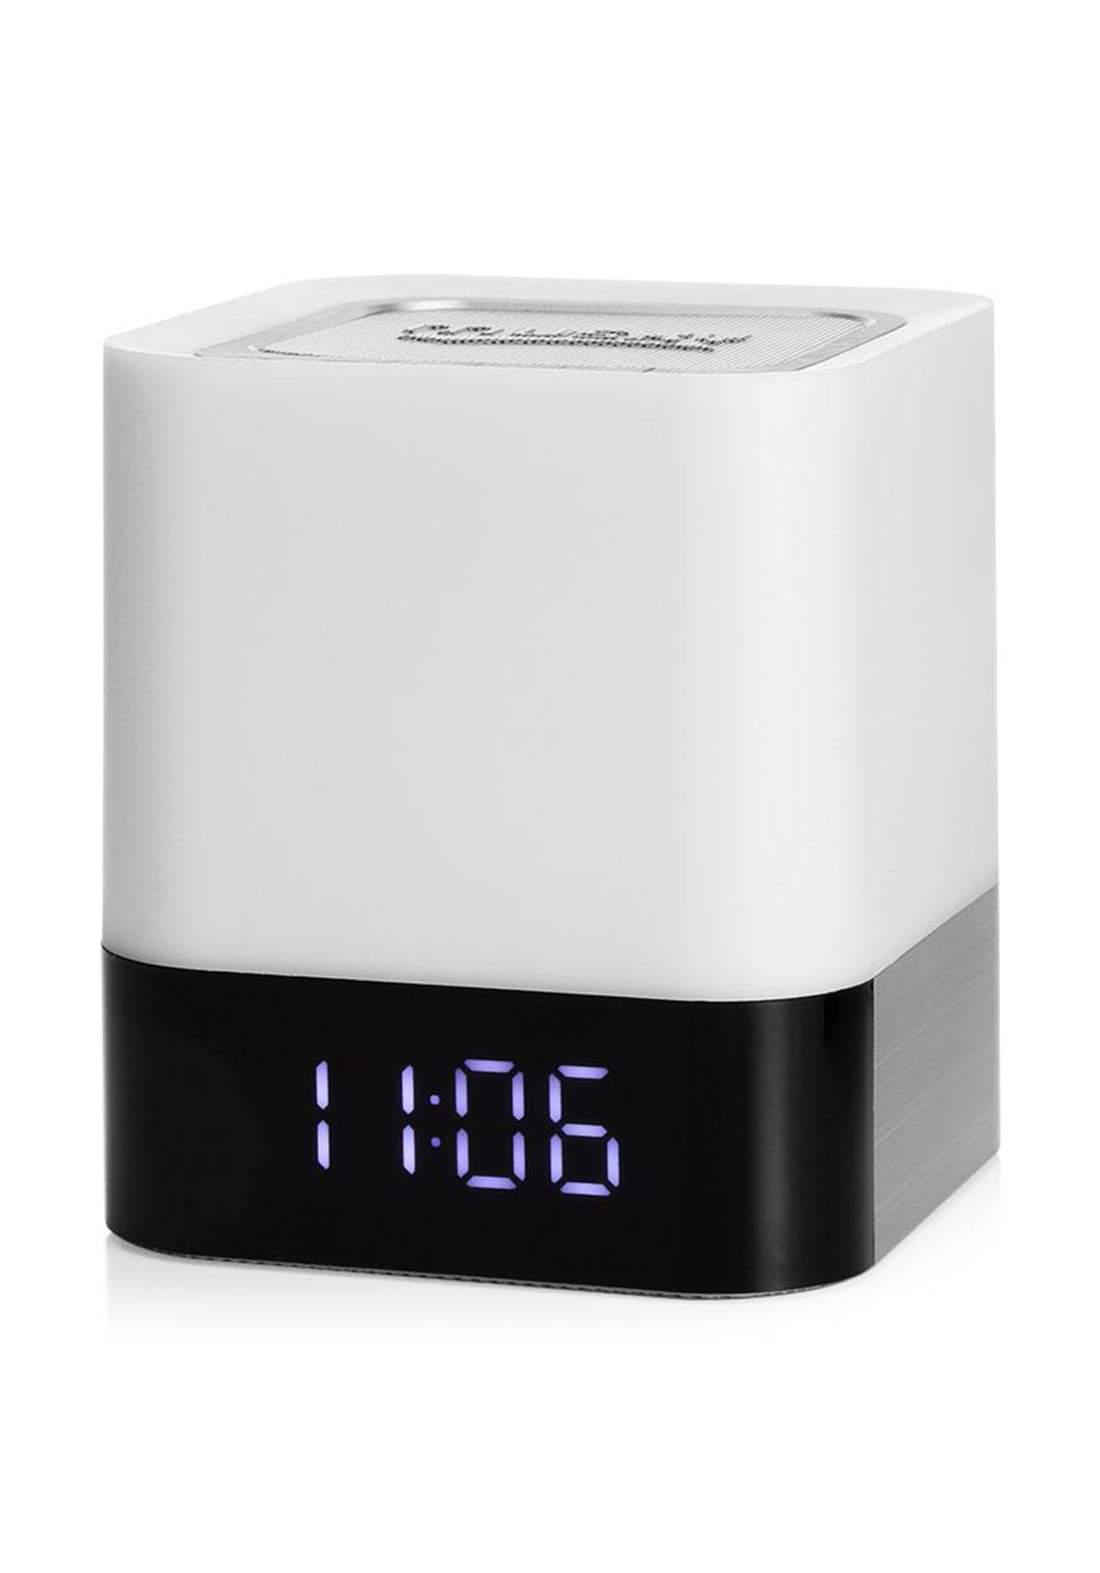 Musky DY28 Alarm Clock Wireless Bluetooth Speaker LED Night Lamp - White   مكبر صوت